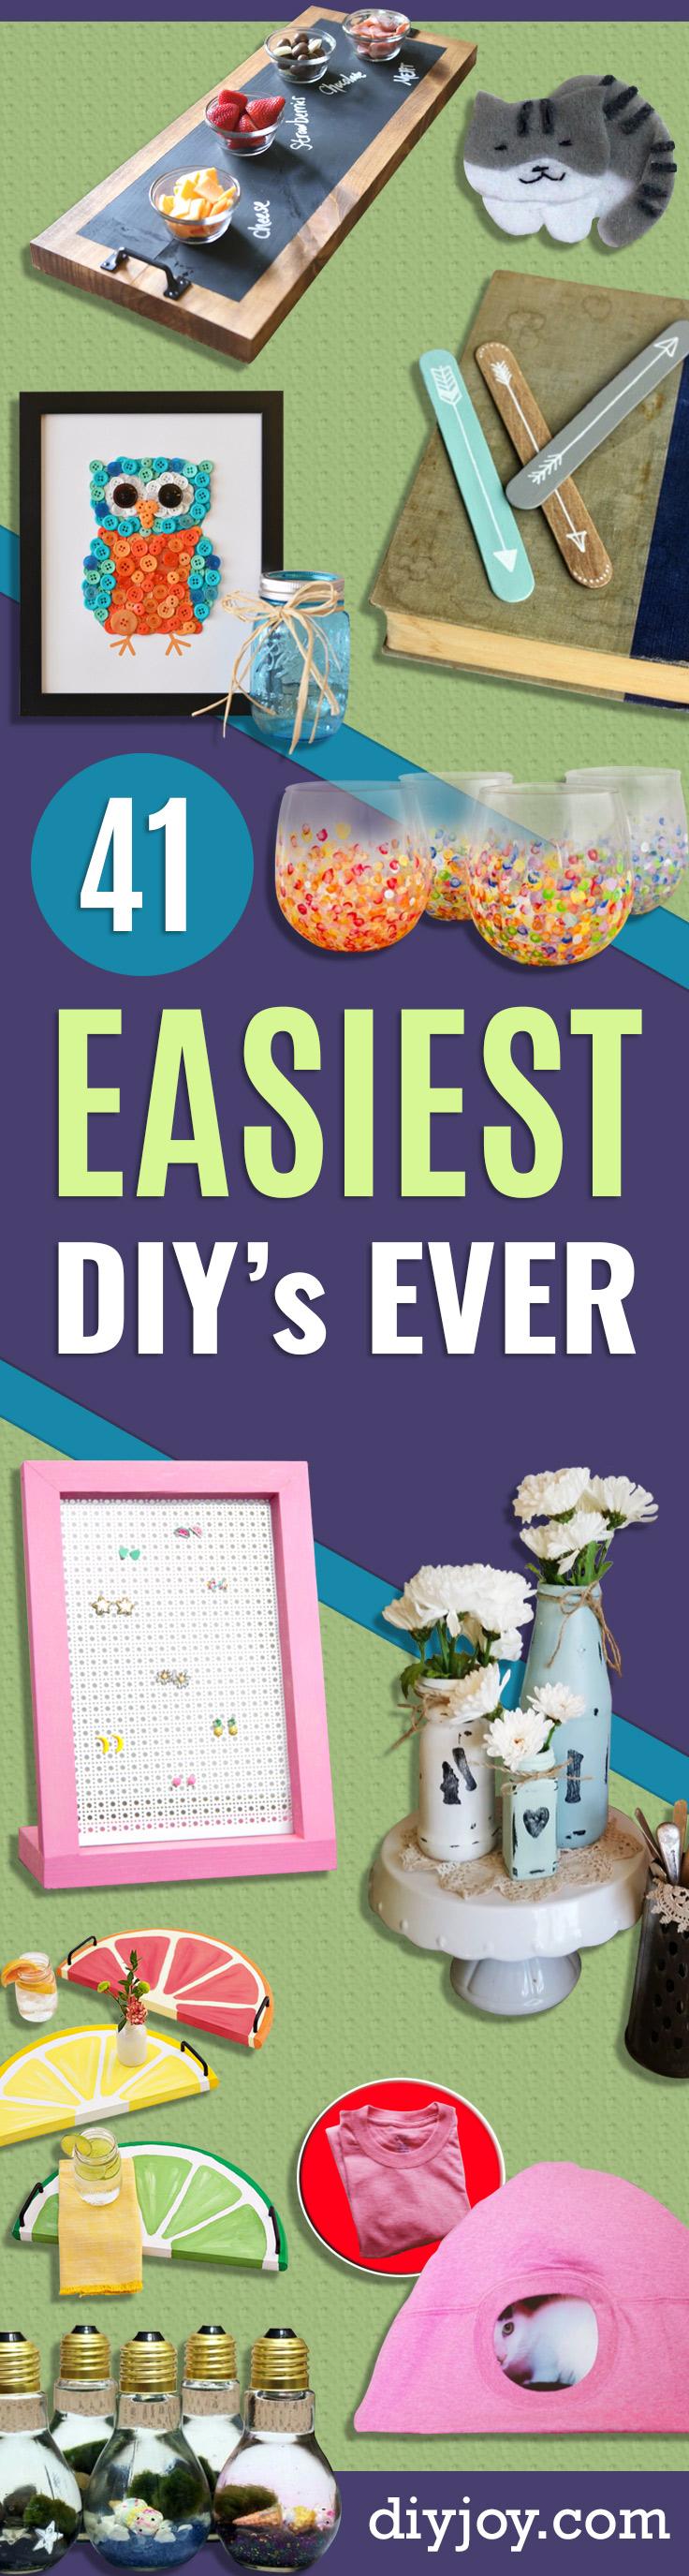 41 of the Easiest DIYs Ever!